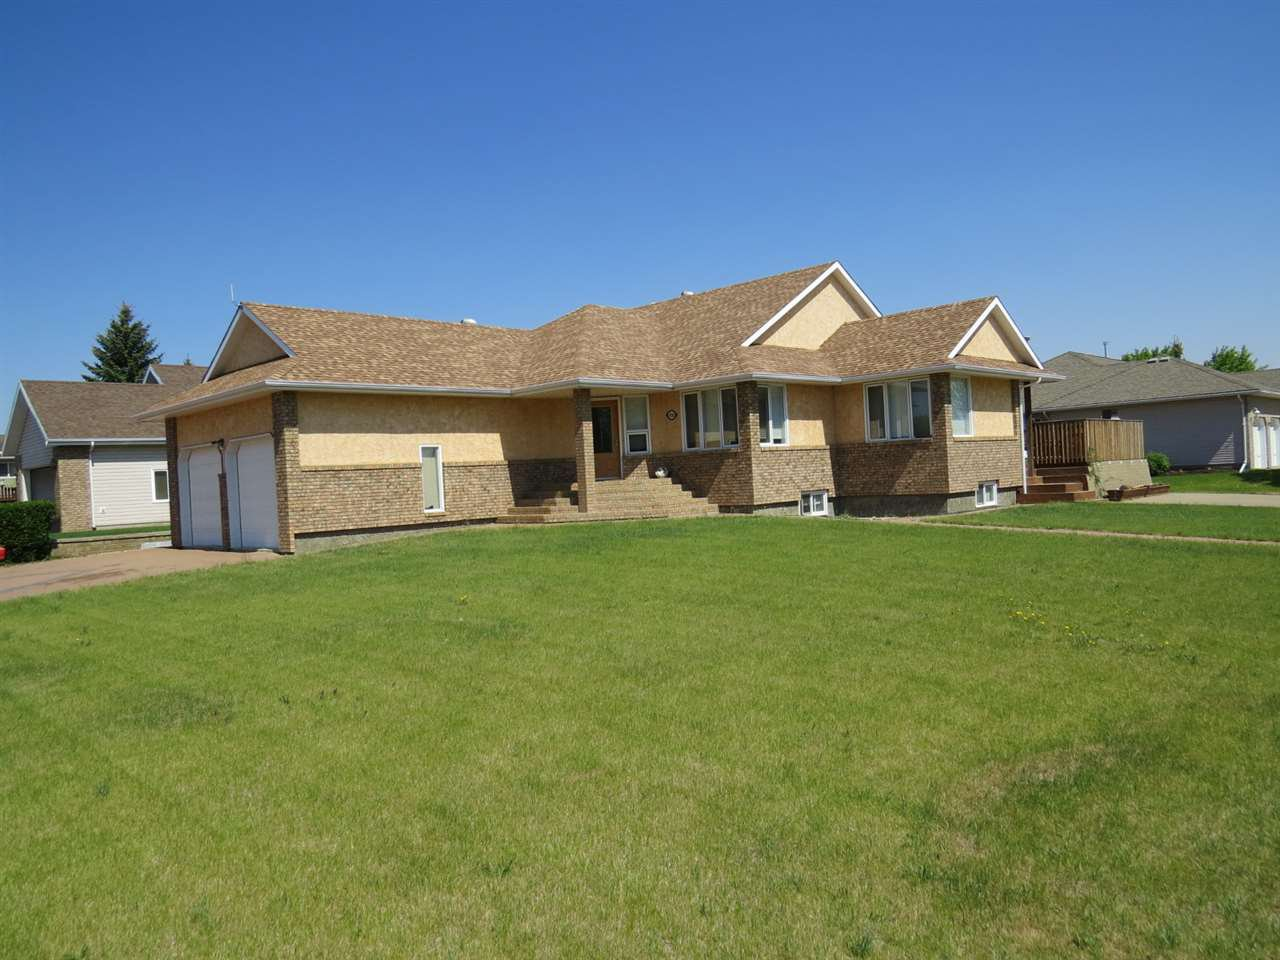 Main Photo: 4508 48 Avenue: Hardisty House for sale : MLS®# E4140231